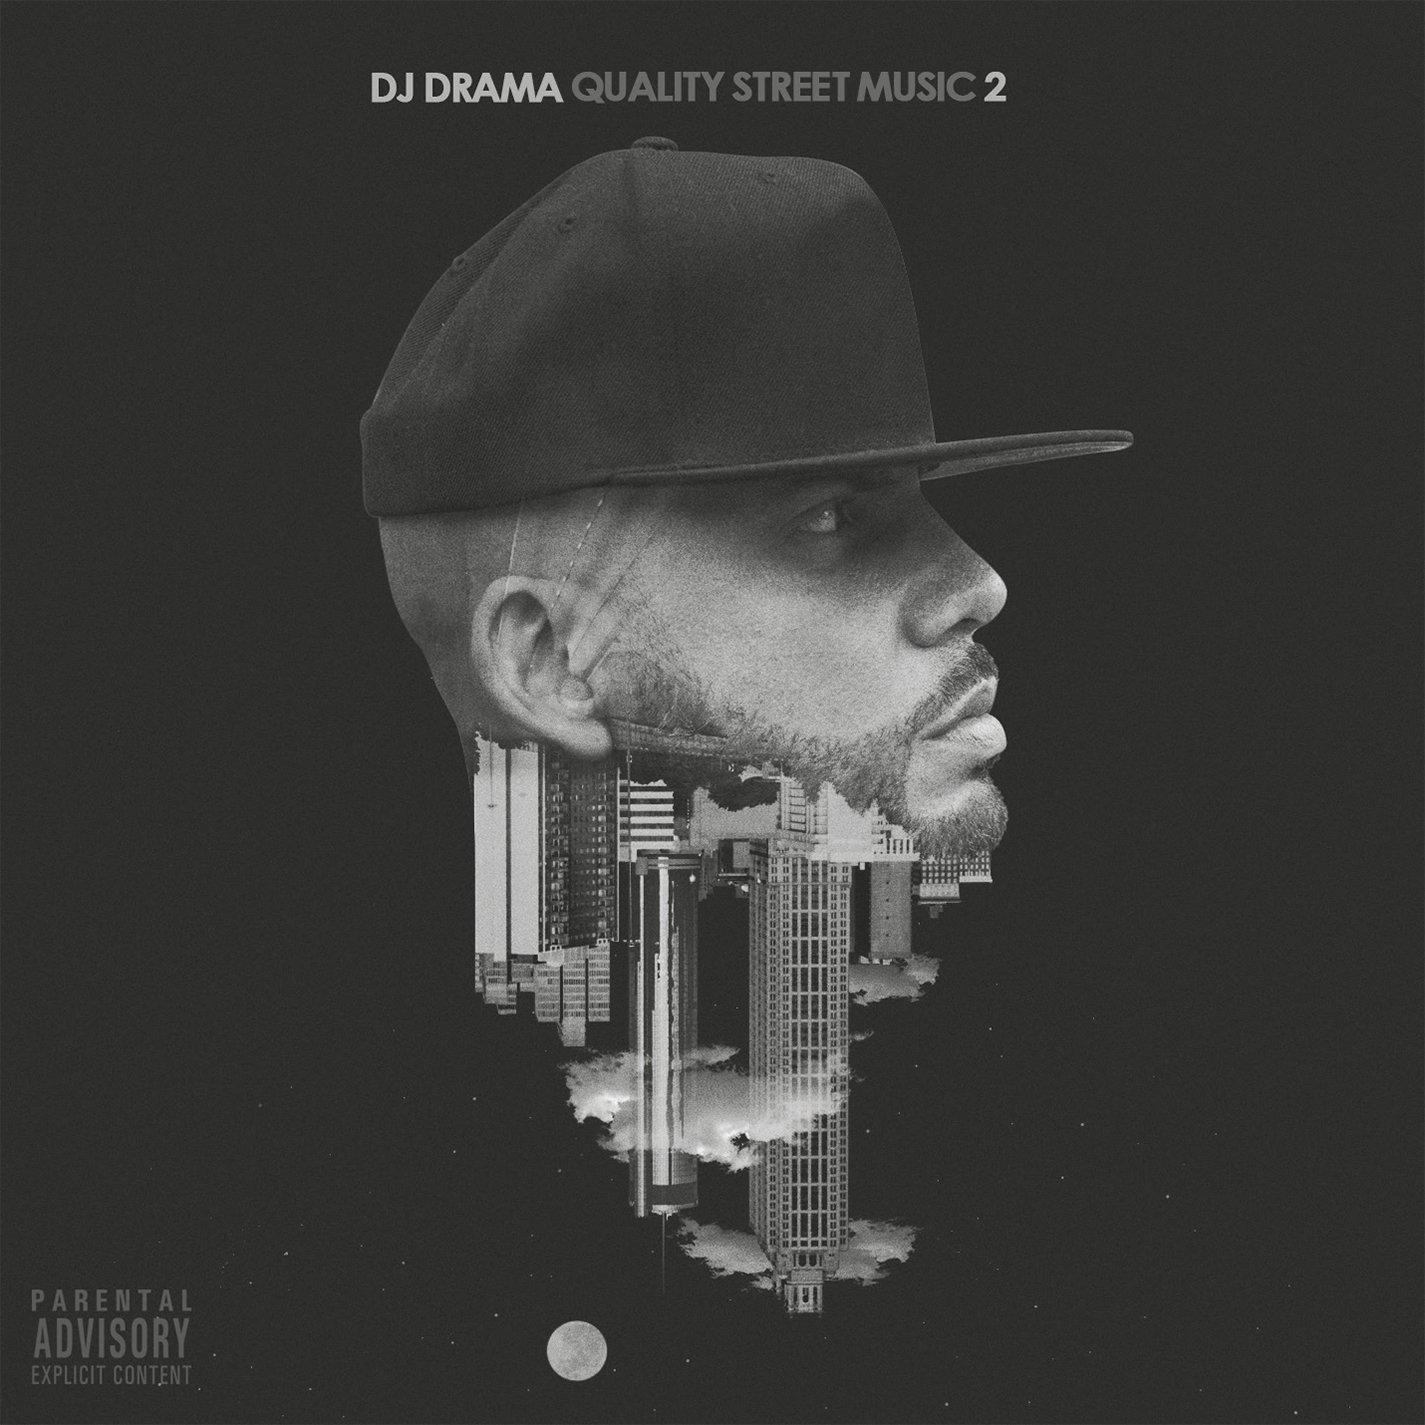 dj-drama-quality-street-music-2-artwork